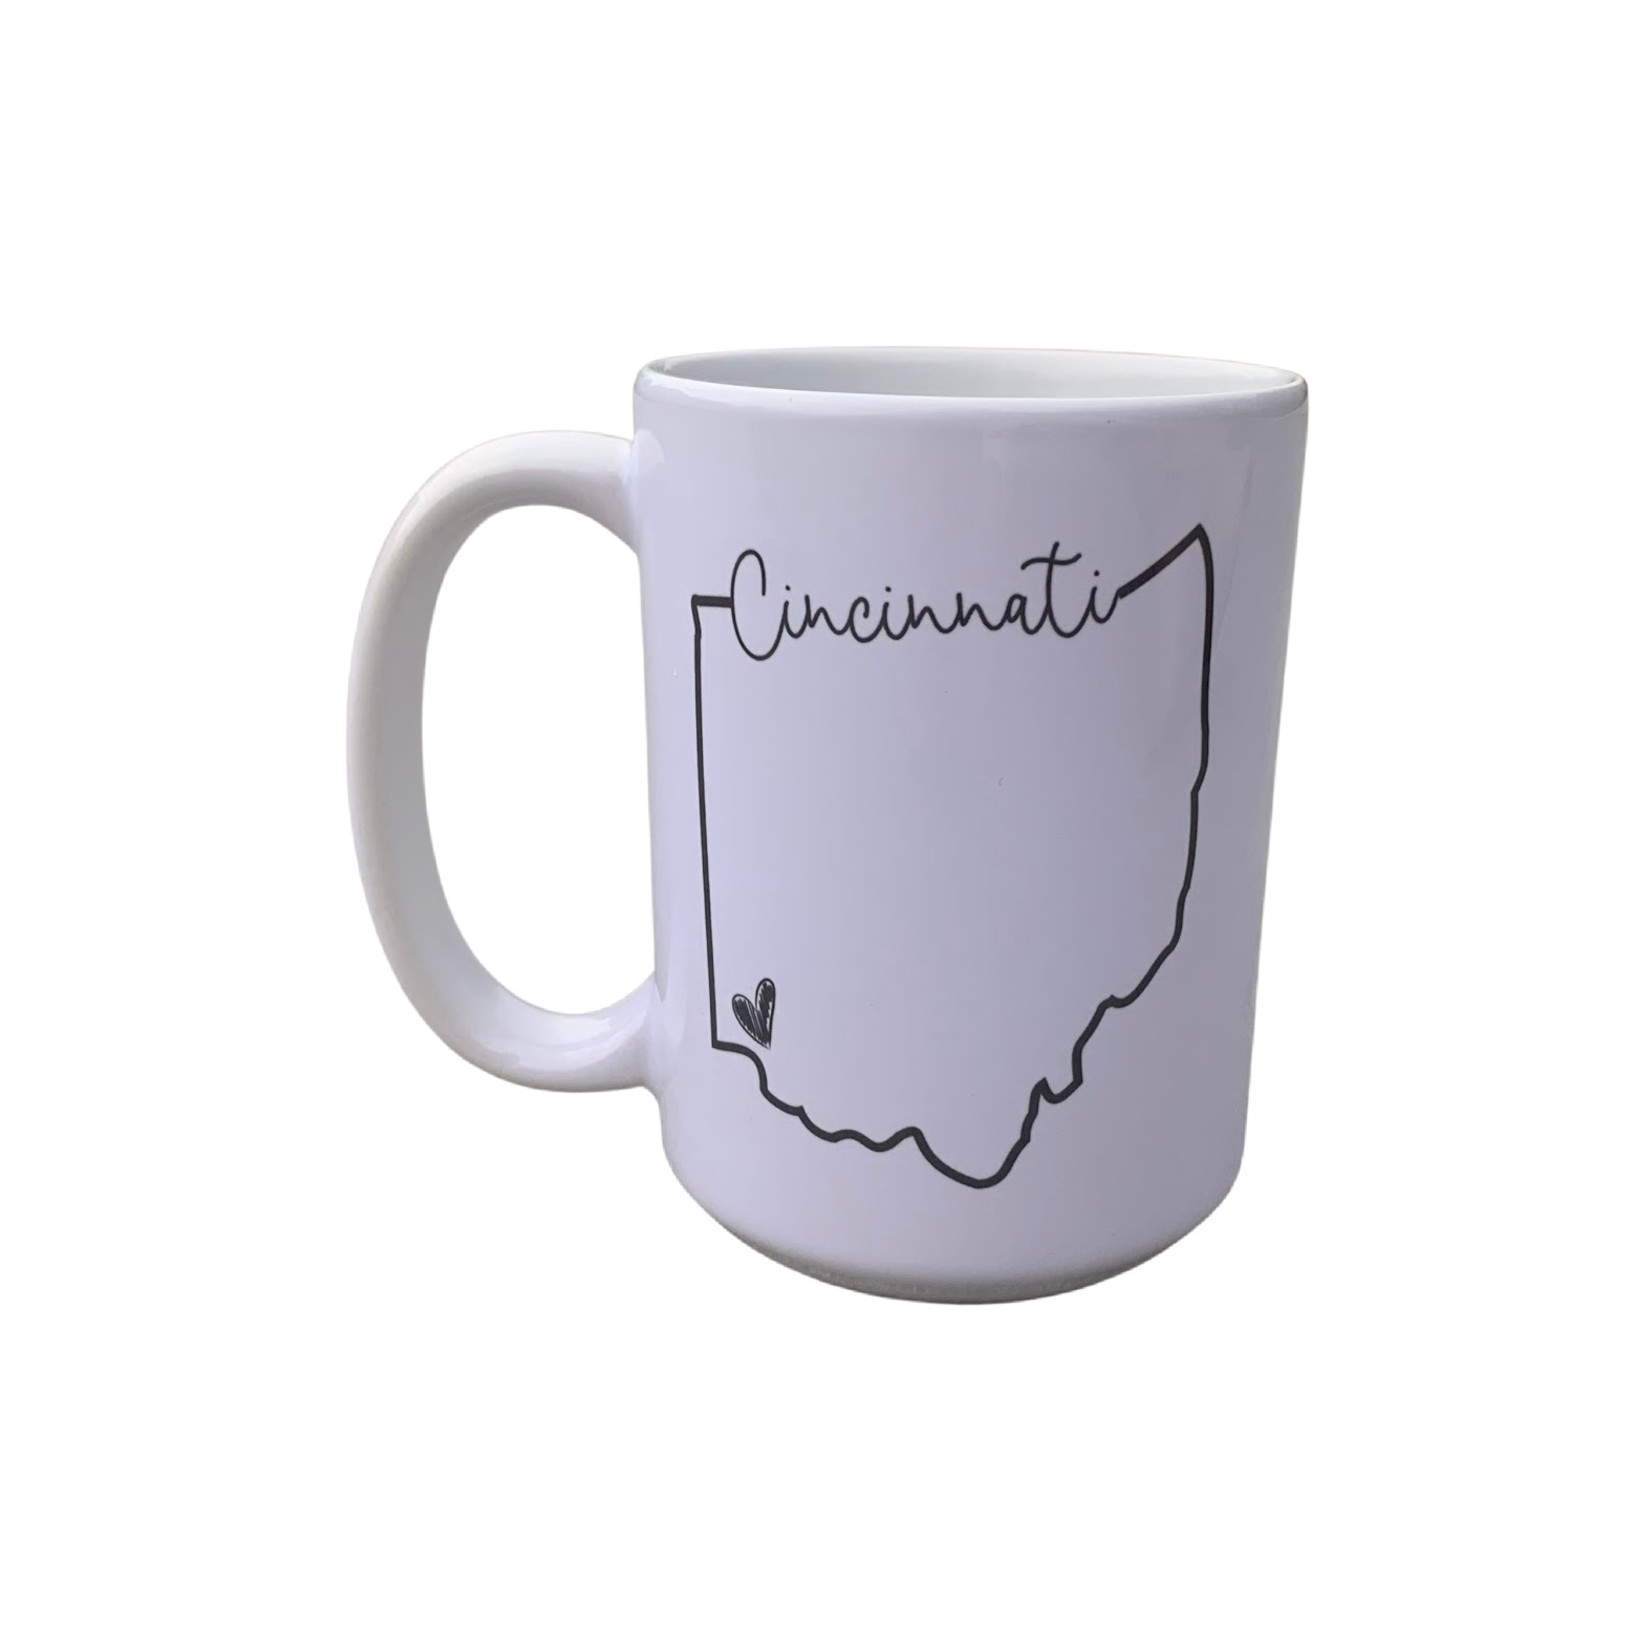 Send Me a Dream Cincinnati Mug